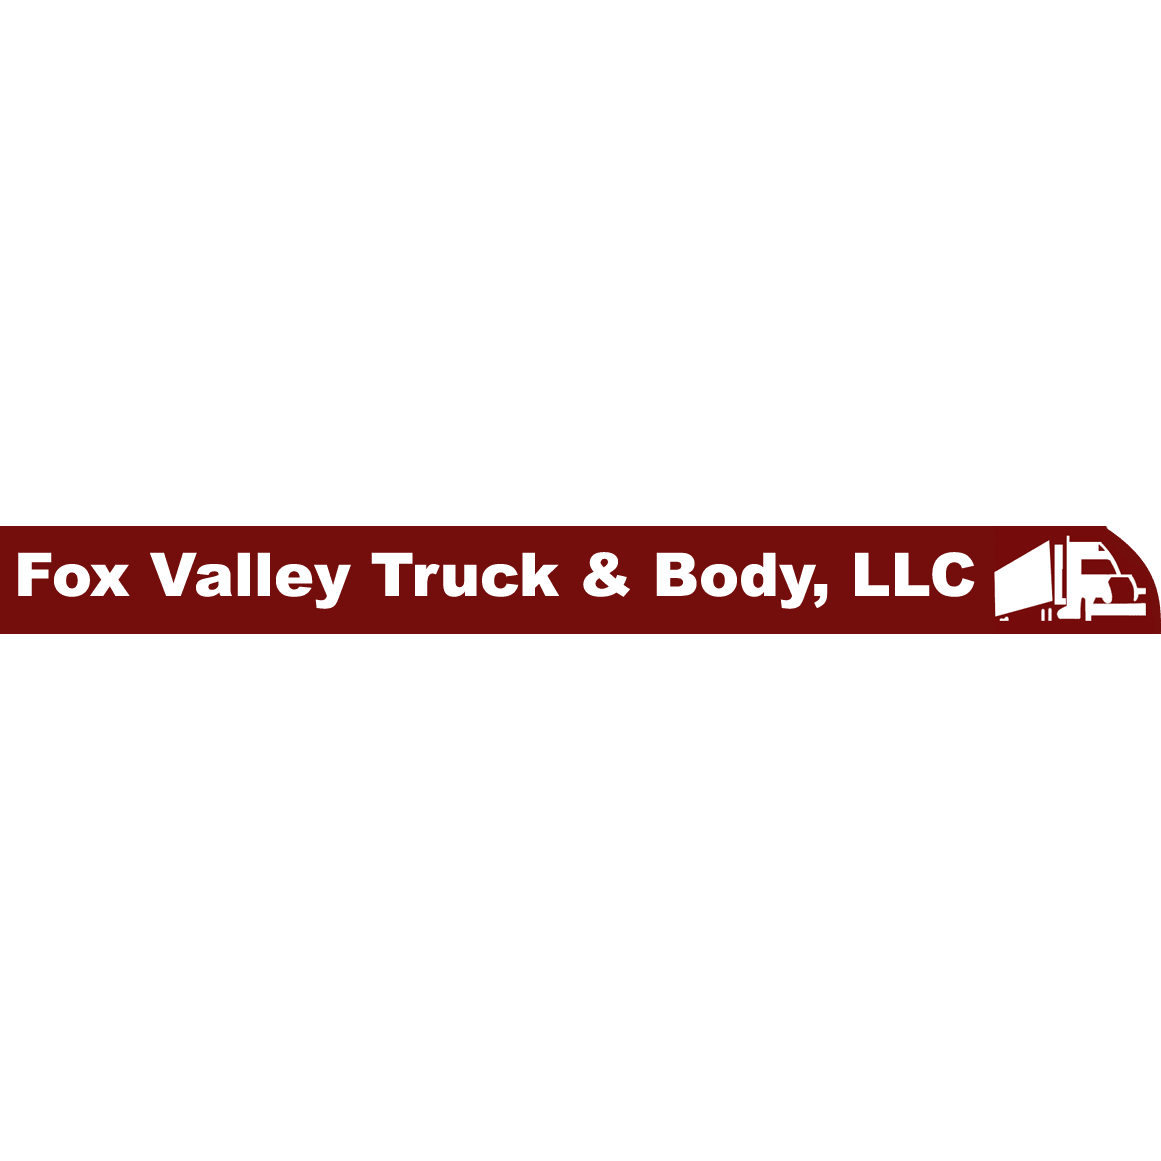 Fox Valley Truck & Body, LLC